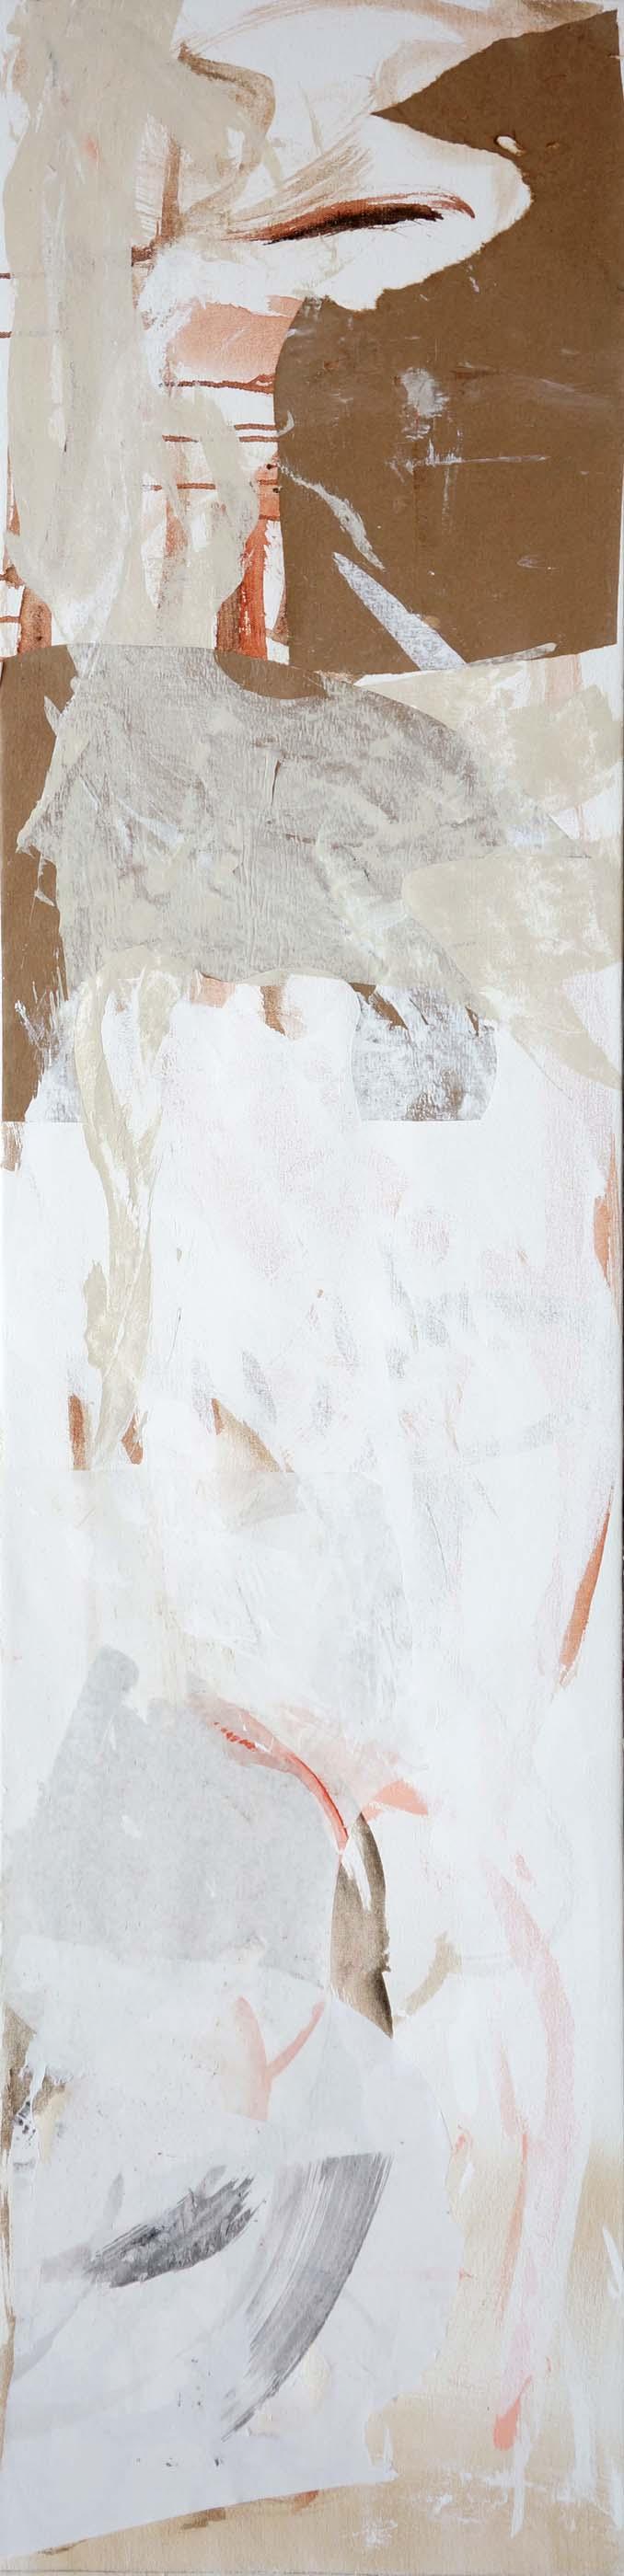 "wu zhen creek  66x16""  acrylic & collaged paper on canvas"